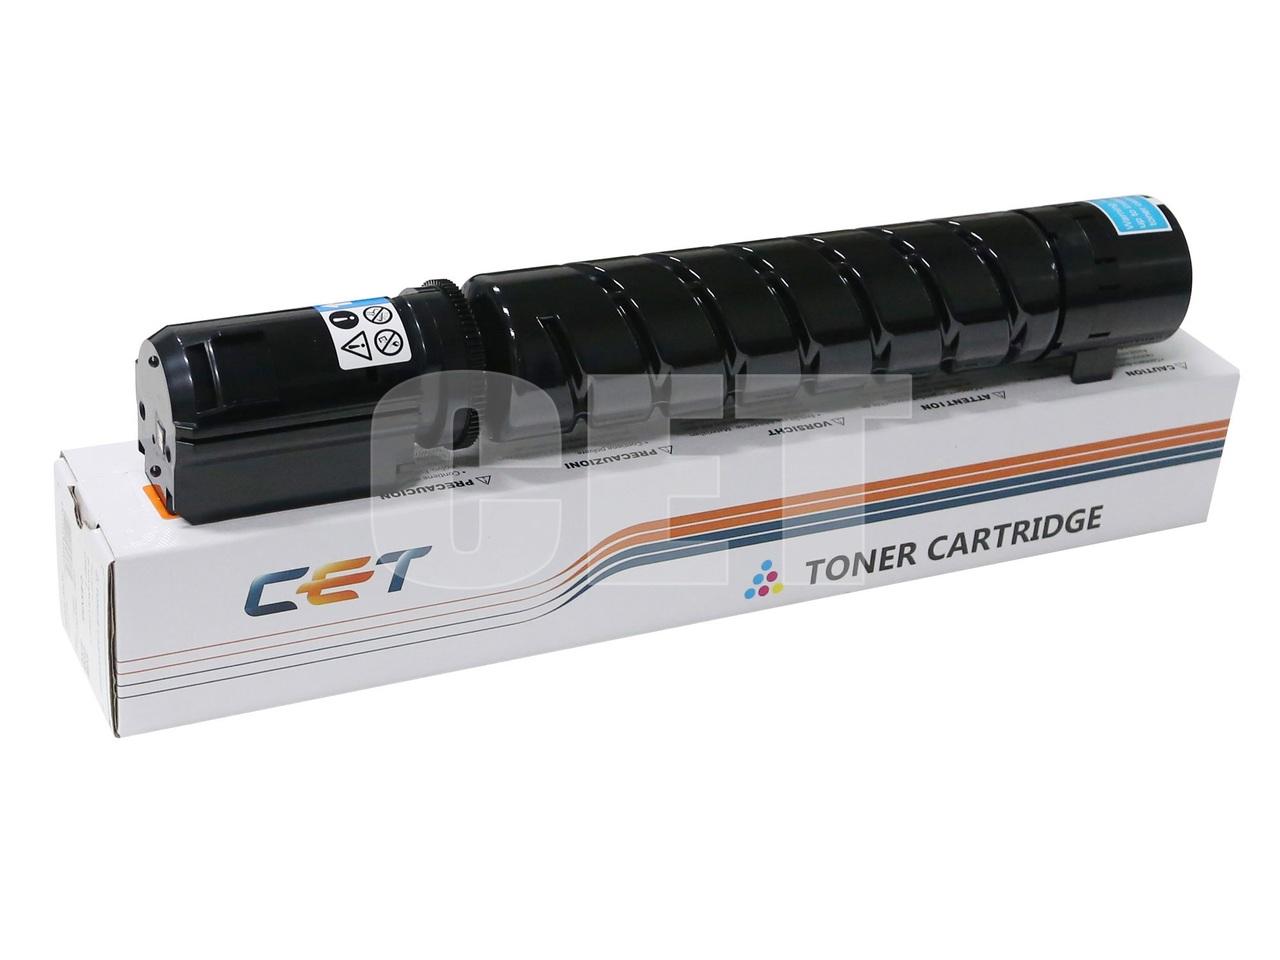 Тонер-картридж (CPP) C-EXV48 для CANON iRC1325iF/1335iF(CET) Cyan, 197г, 11500 стр., CET141304